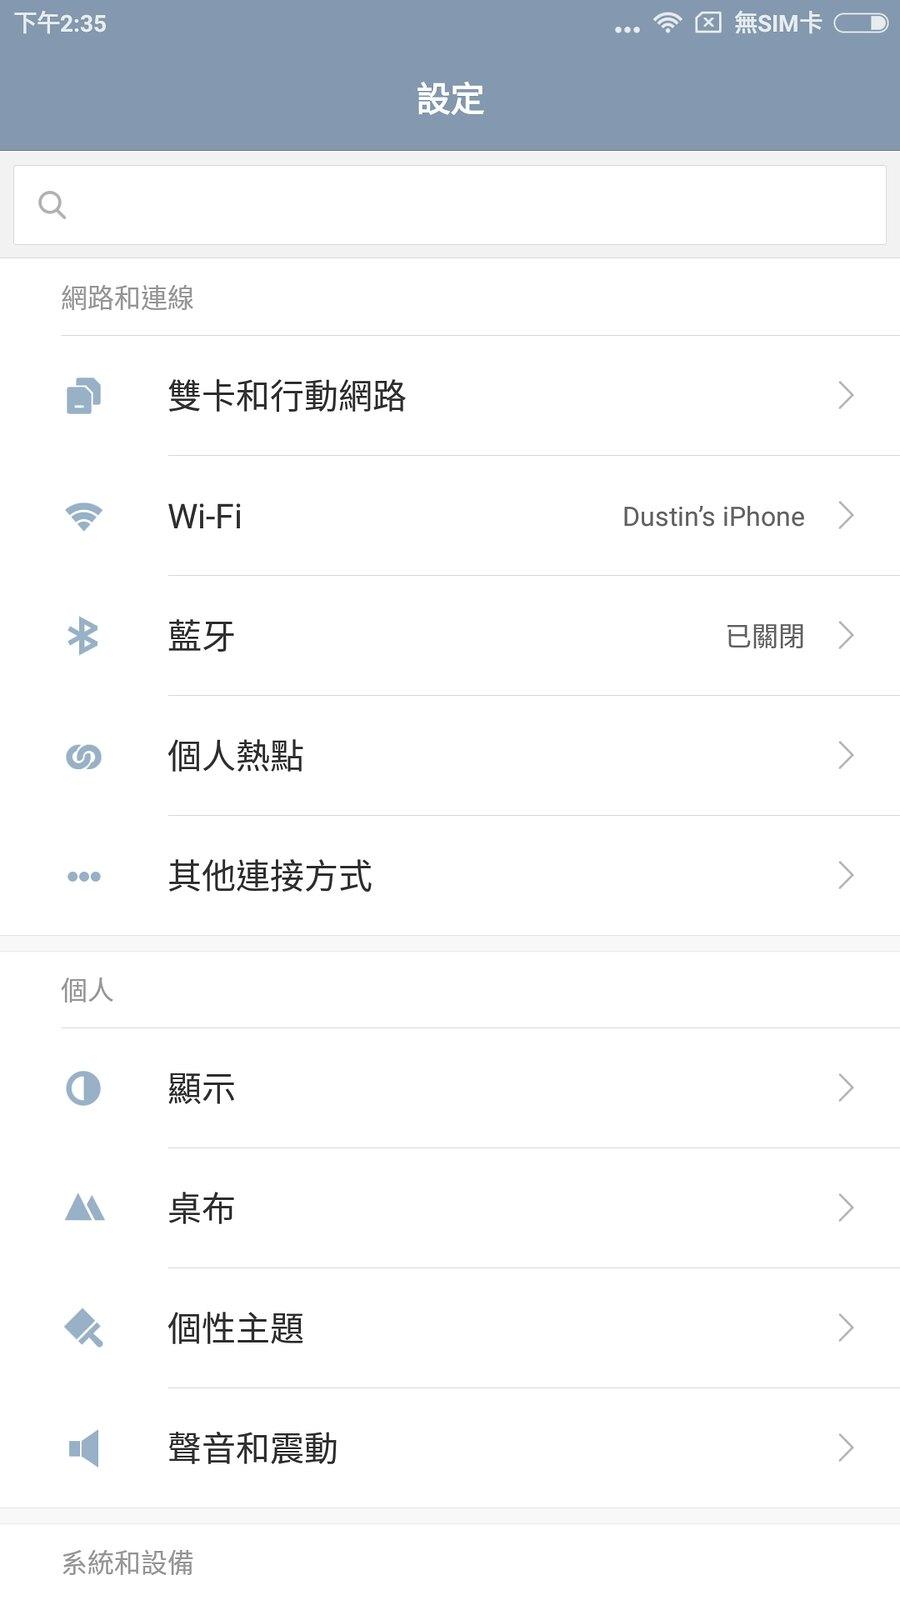 Screenshot_2016-12-04-14-35-37-623_com.android.settings